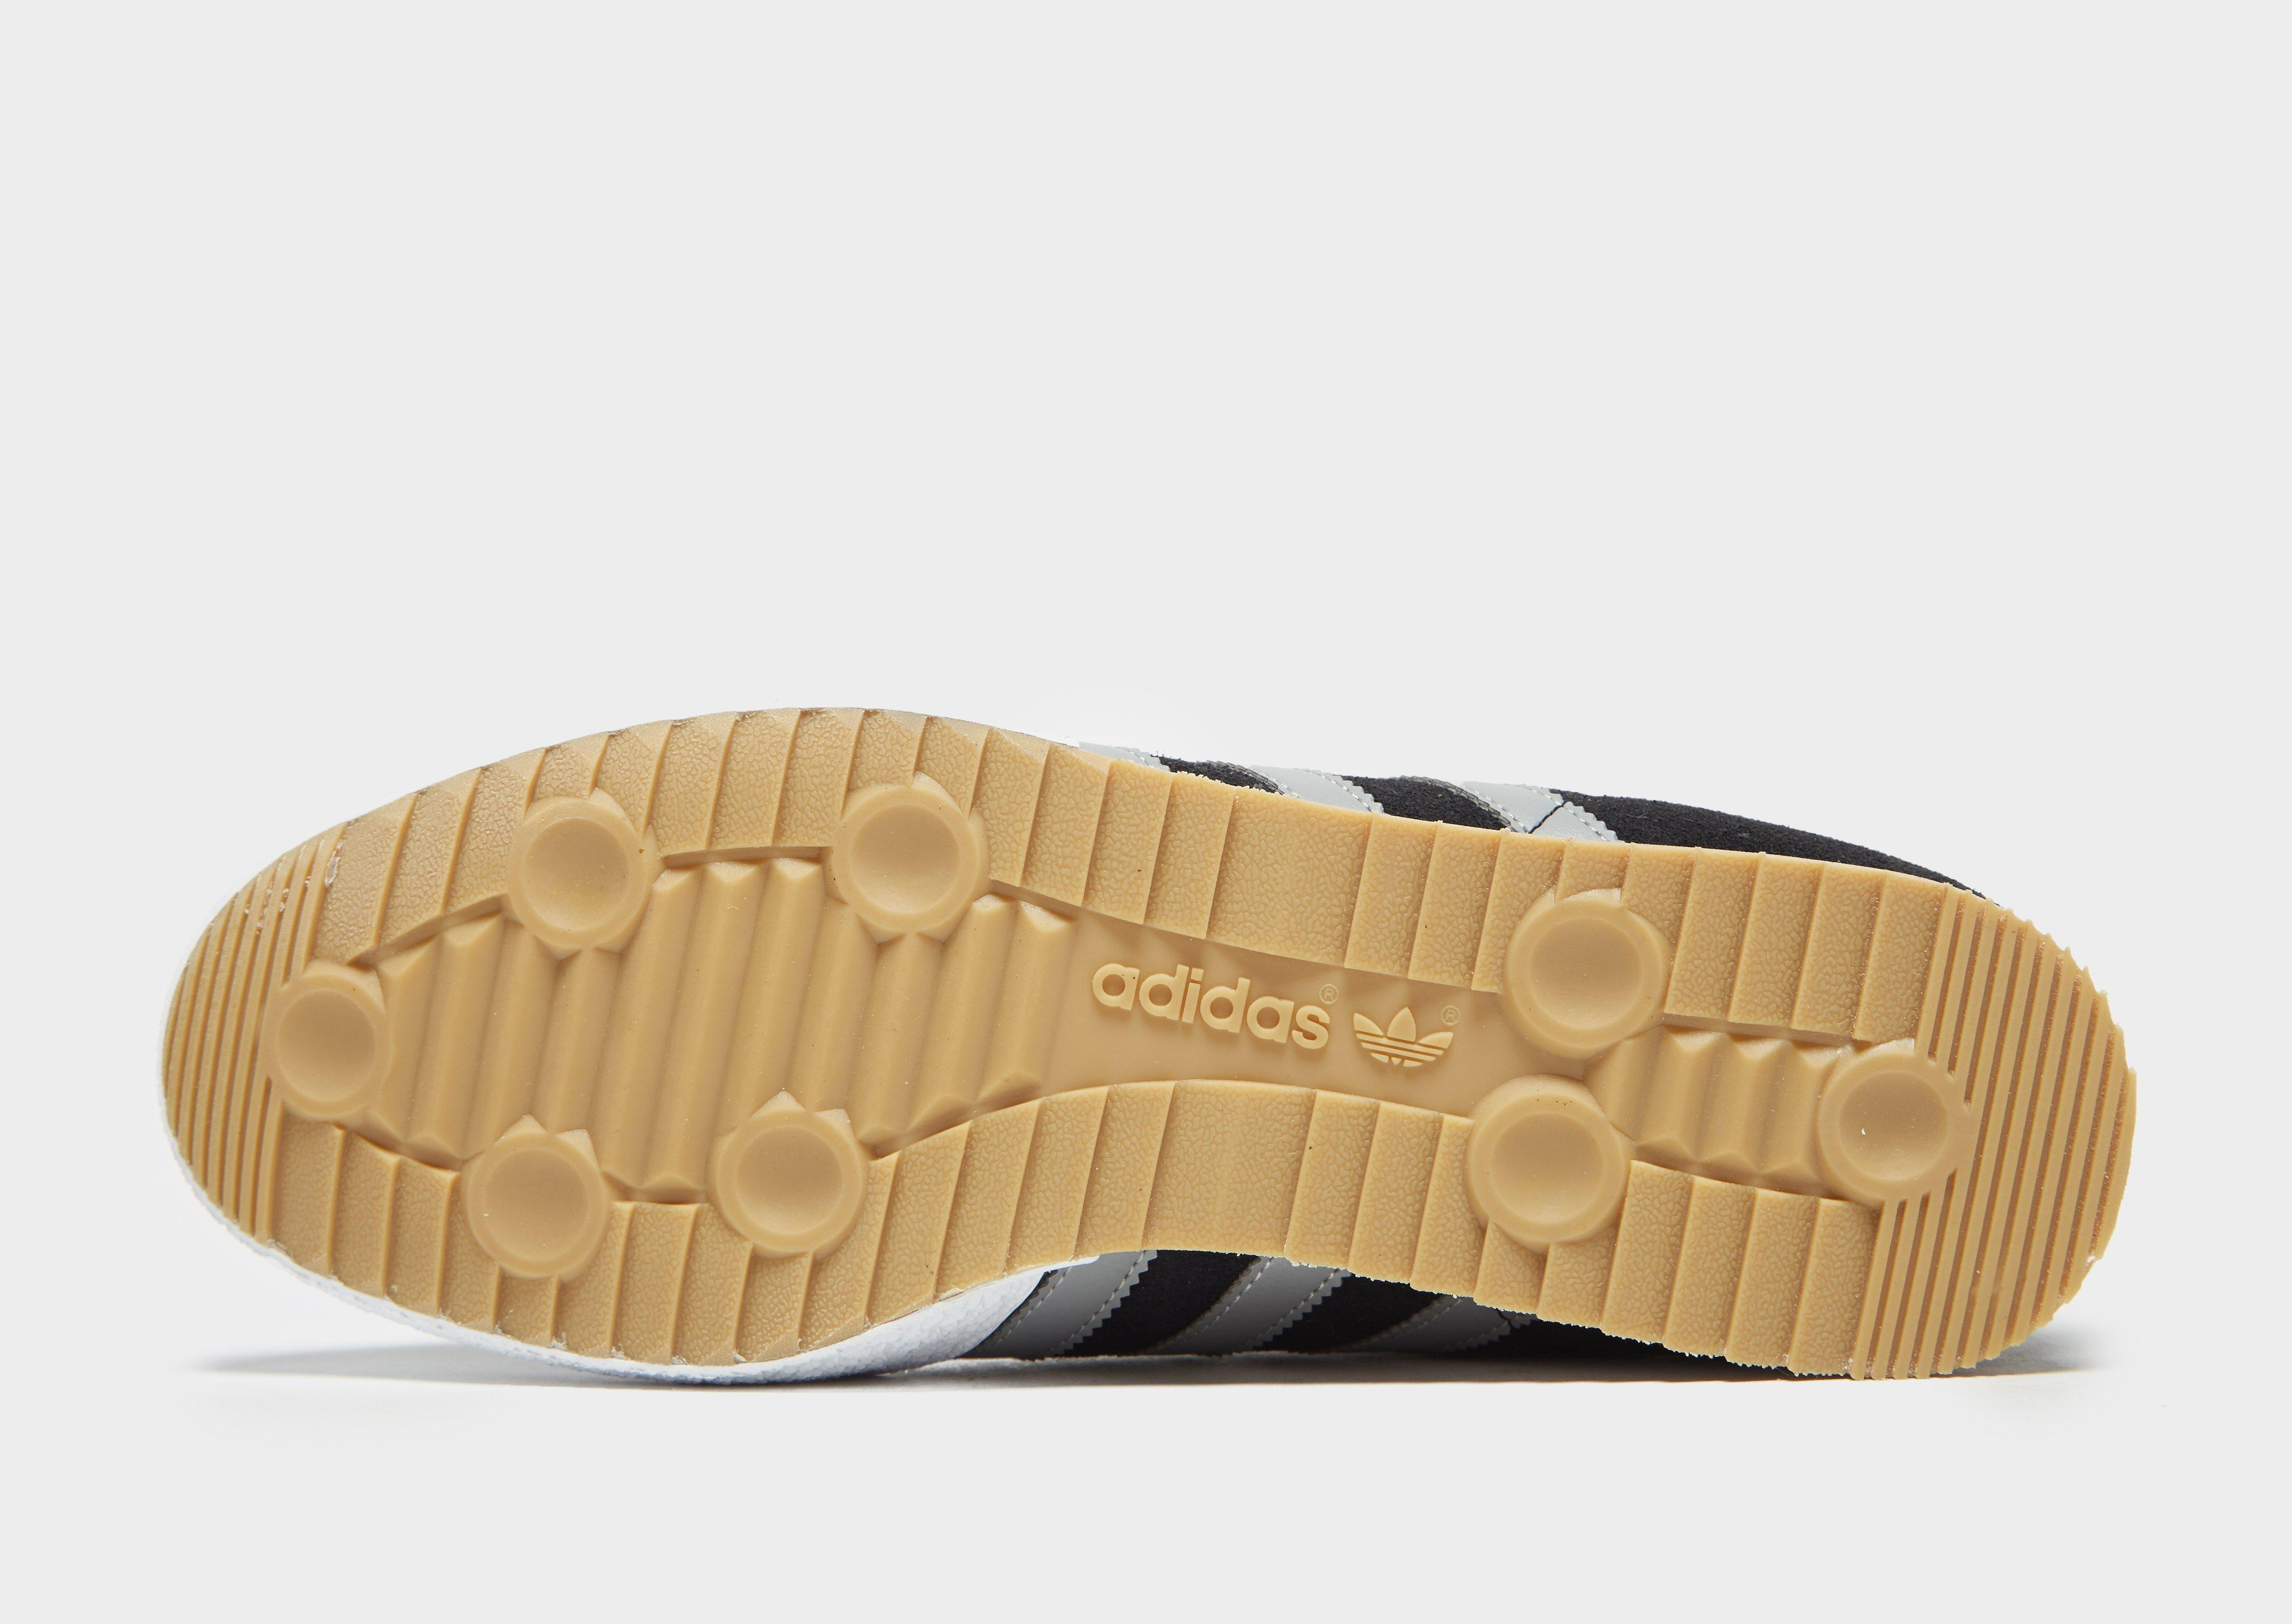 f68ca289bb1970 Lyst - adidas Originals Samba Super Trainers Black white gum in ...